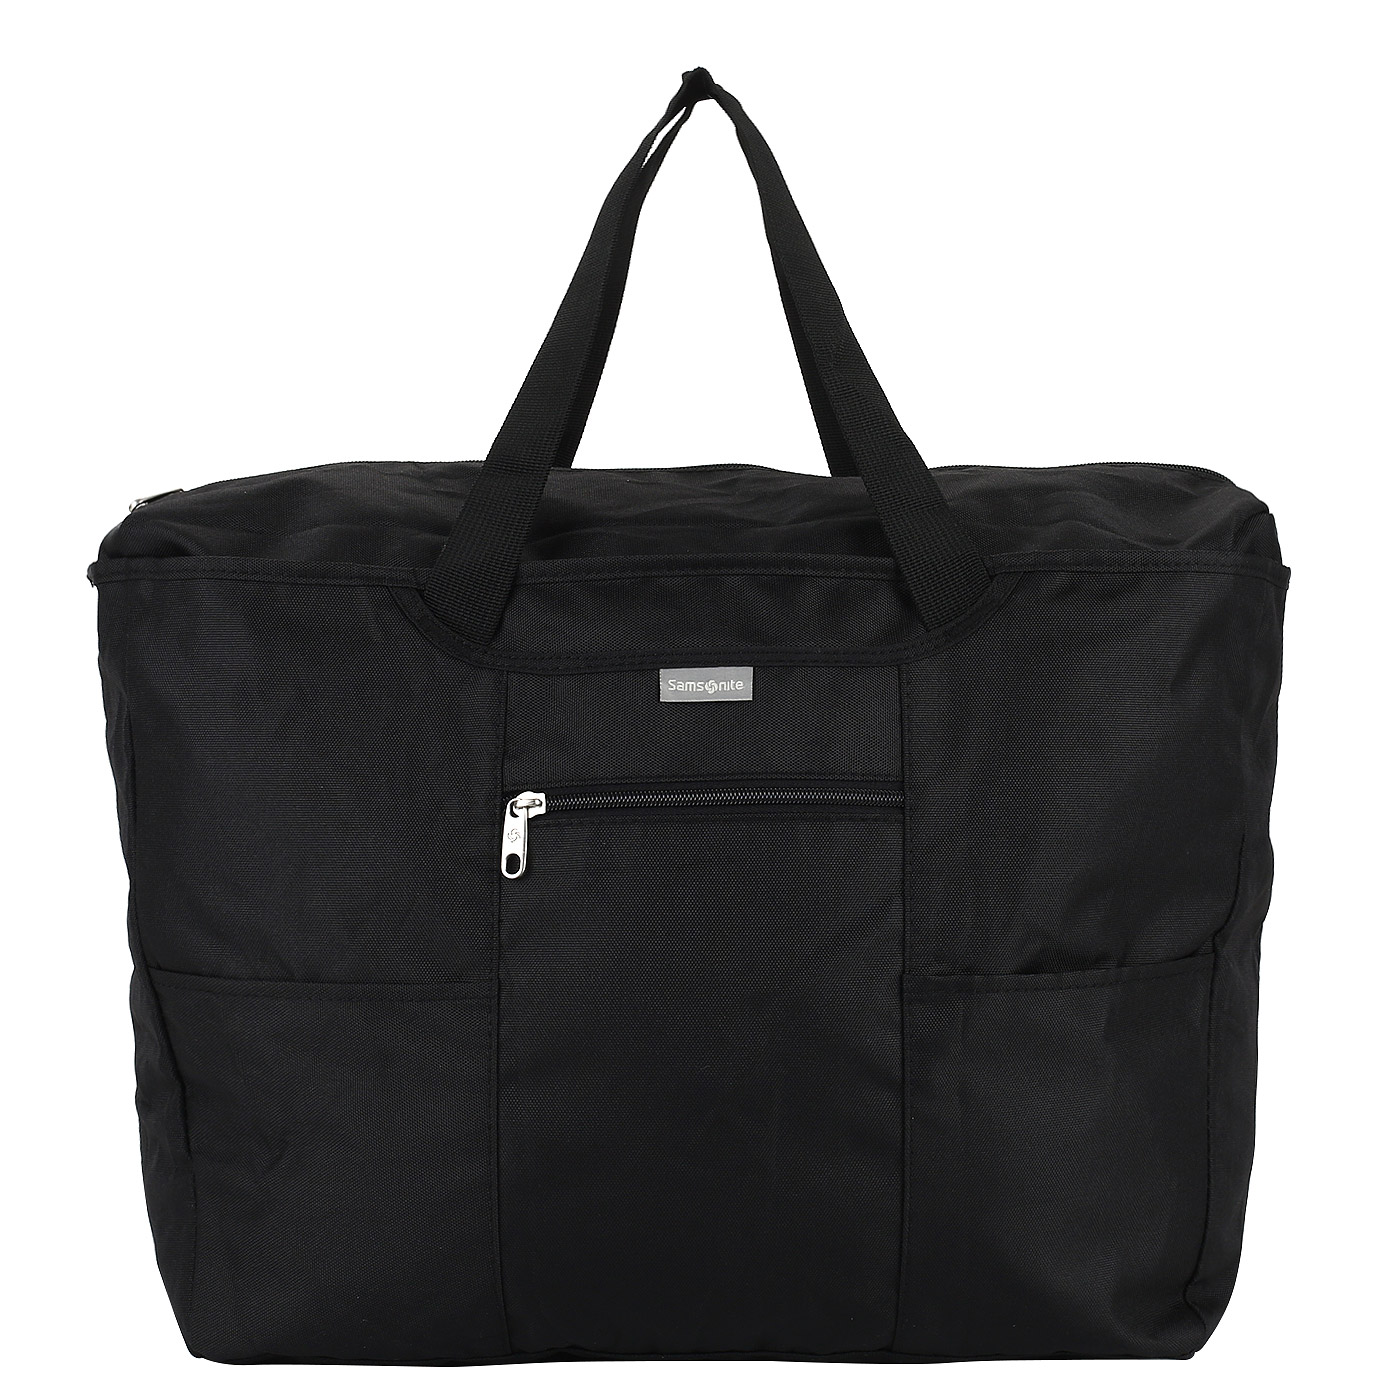 b75fb7461a36 Складная дорожная сумка Samsonite Packing Accessories Складная дорожная  сумка Samsonite Packing Accessories ...